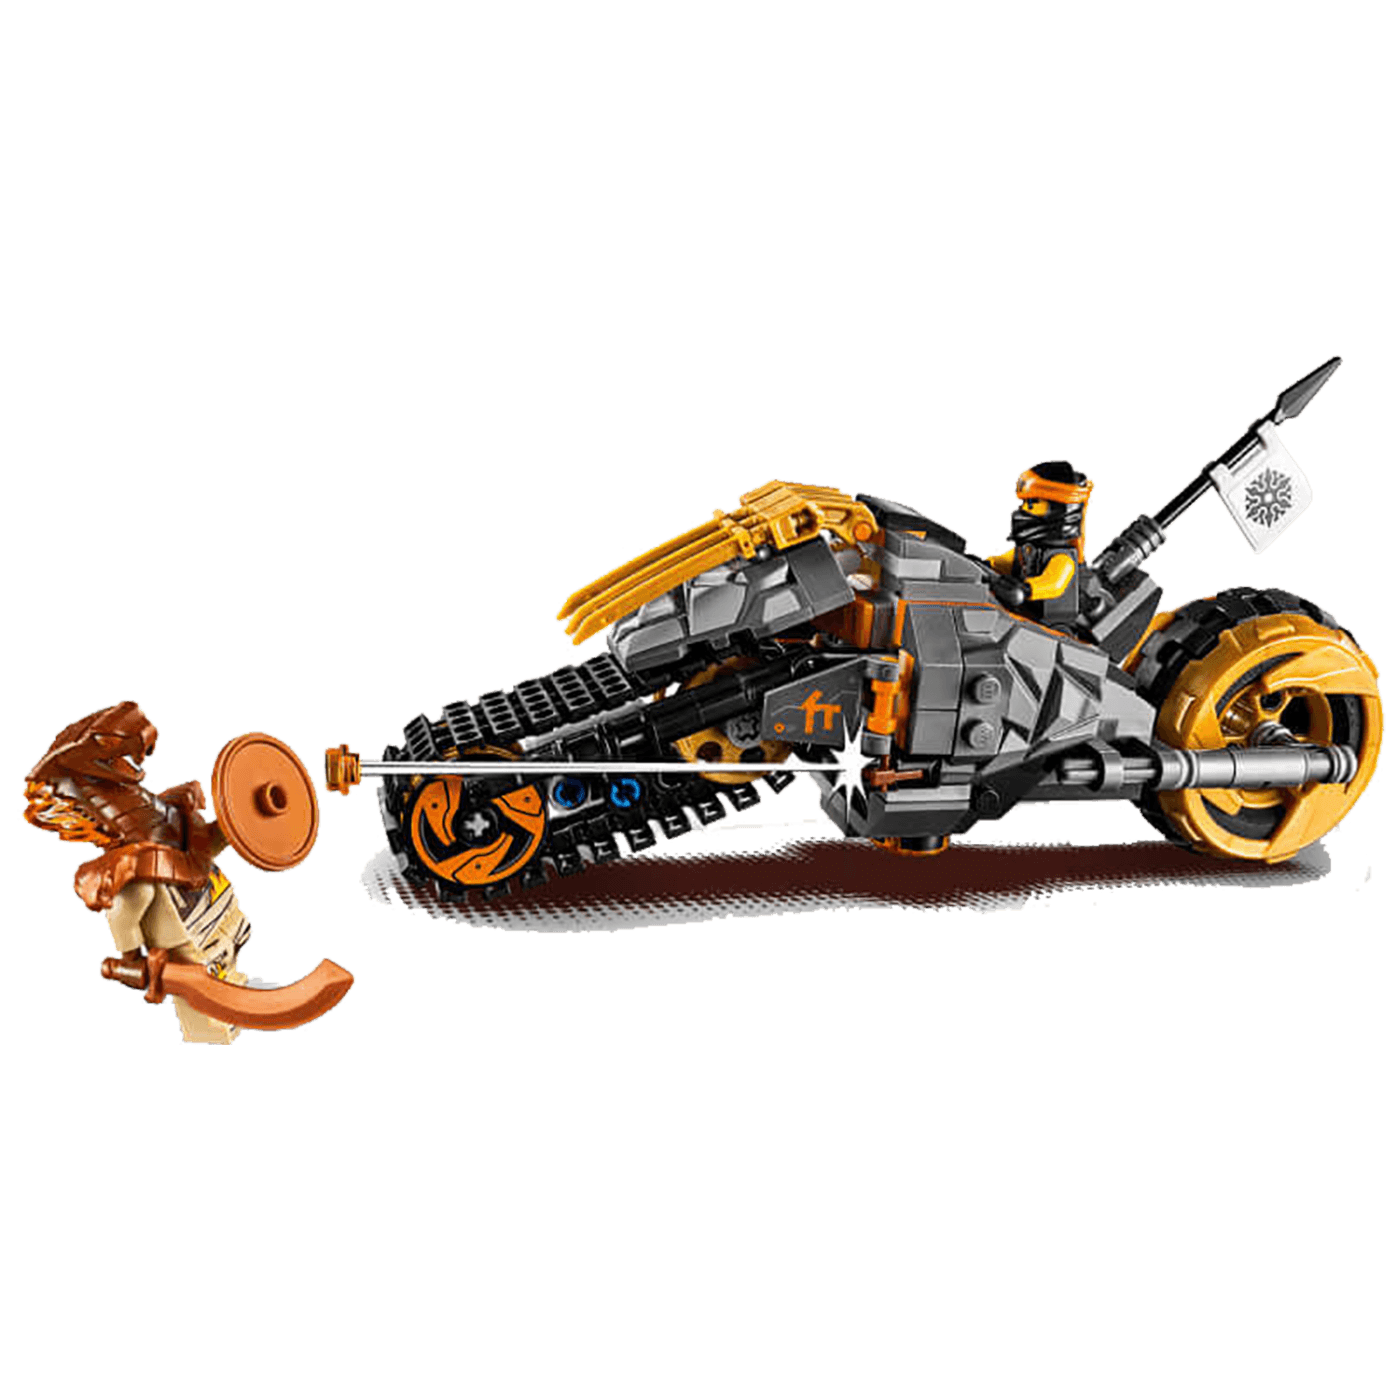 Coleov brdski motocikl, LEGO Ninjago